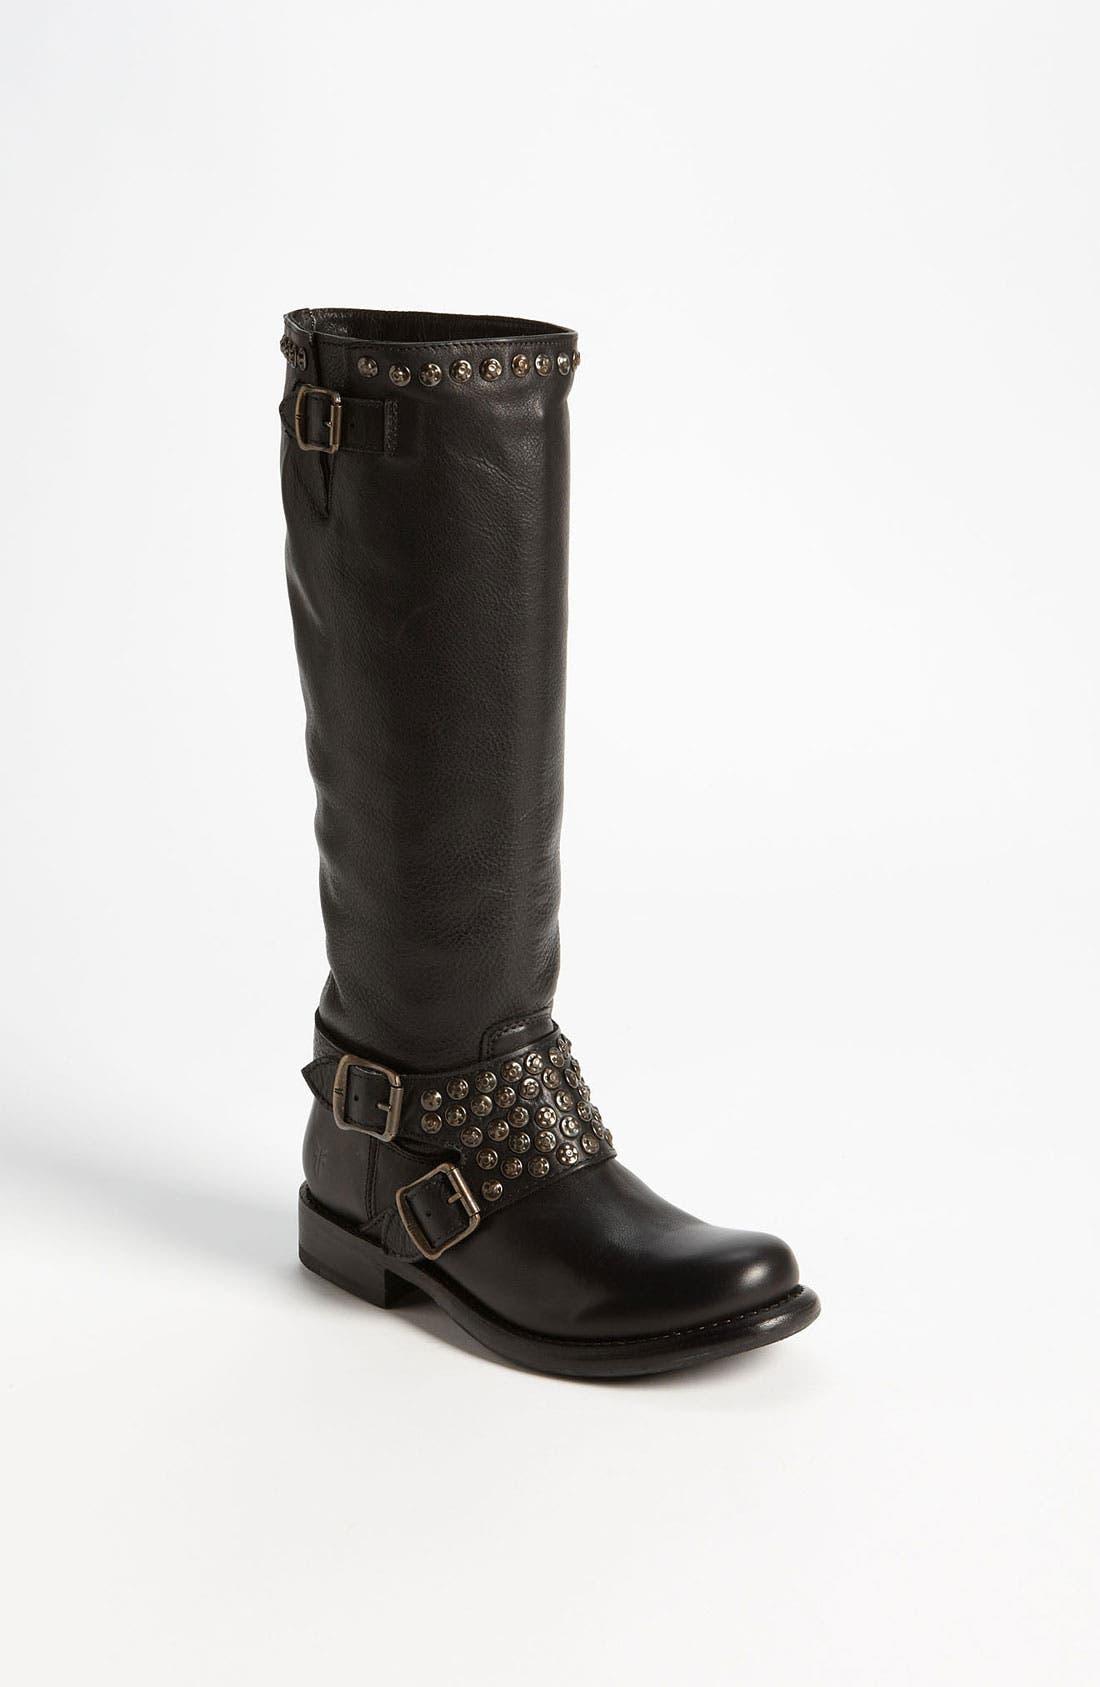 Alternate Image 1 Selected - Frye 'Jenna' Tall Boot